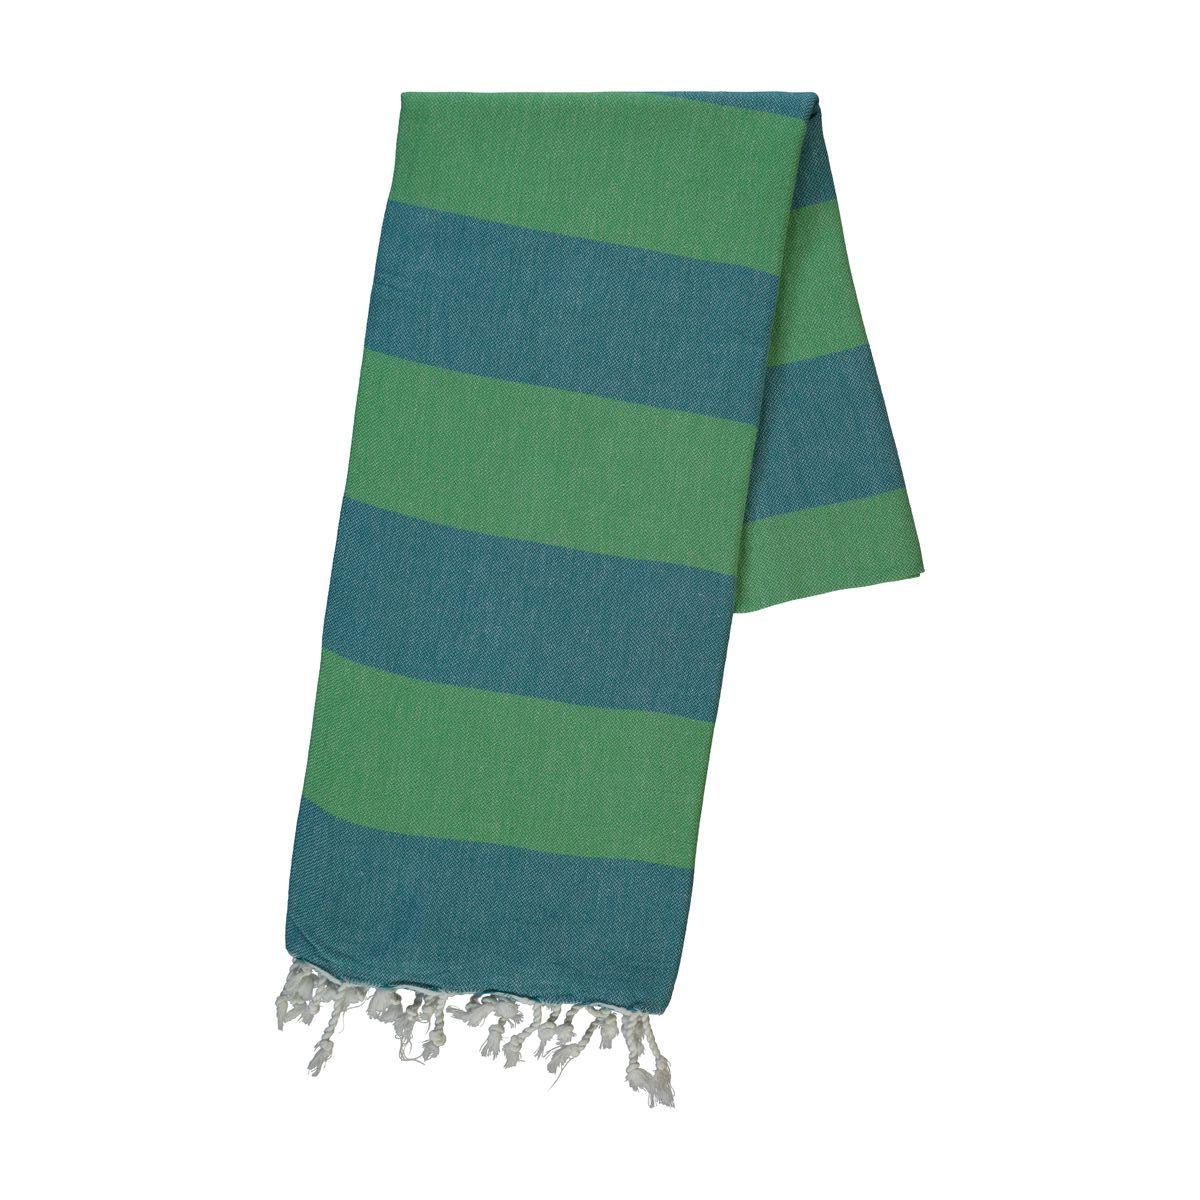 Peştemal Tenedos - Açık Yeşil / Koyu Yeşil